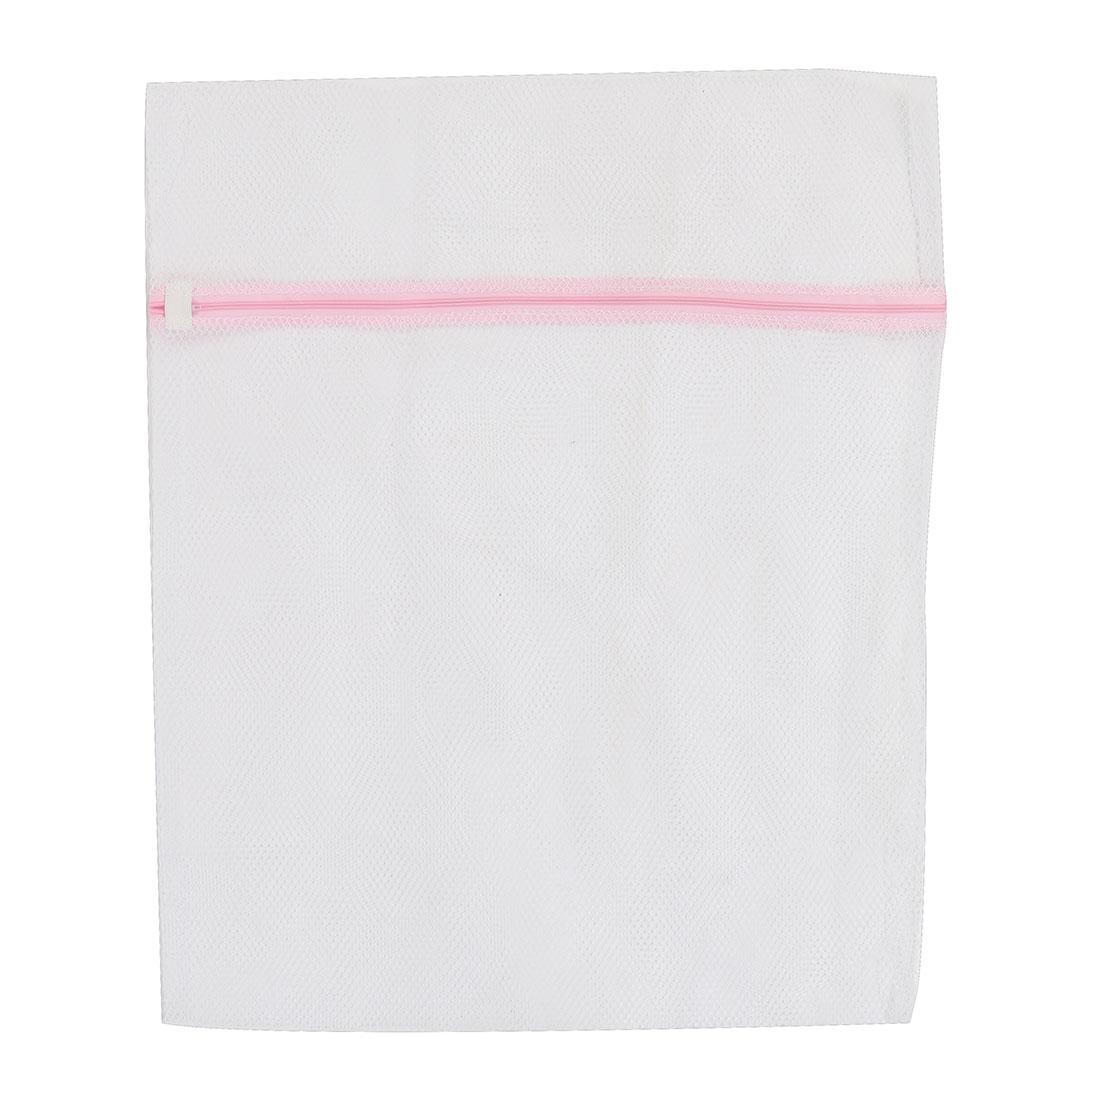 Home Laundry Washing Machine Clothes Socks Underwear Mesh Zippered Washing Bag